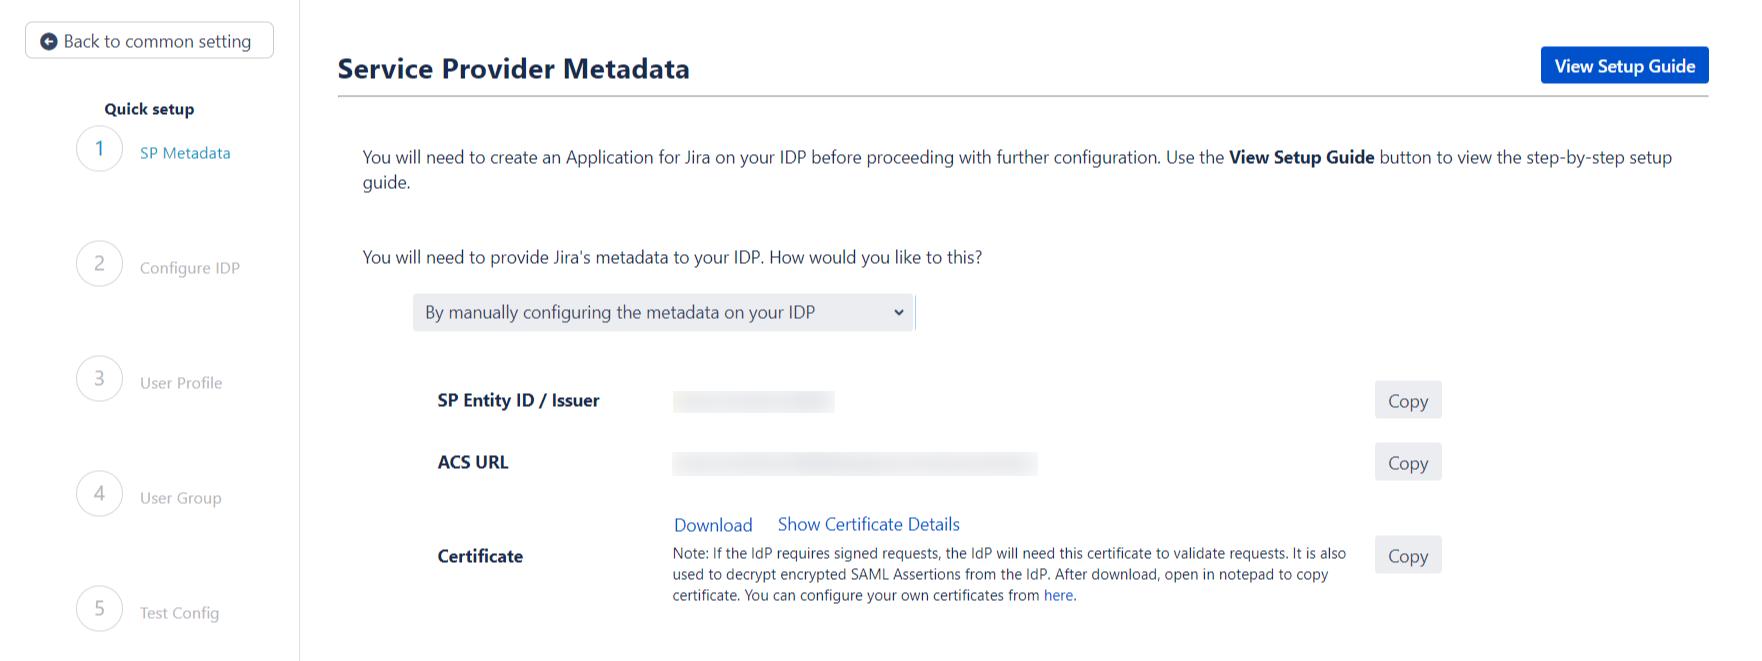 SAML Single Sign On (SSO) into Jira, Quick Setup sp metadata manual